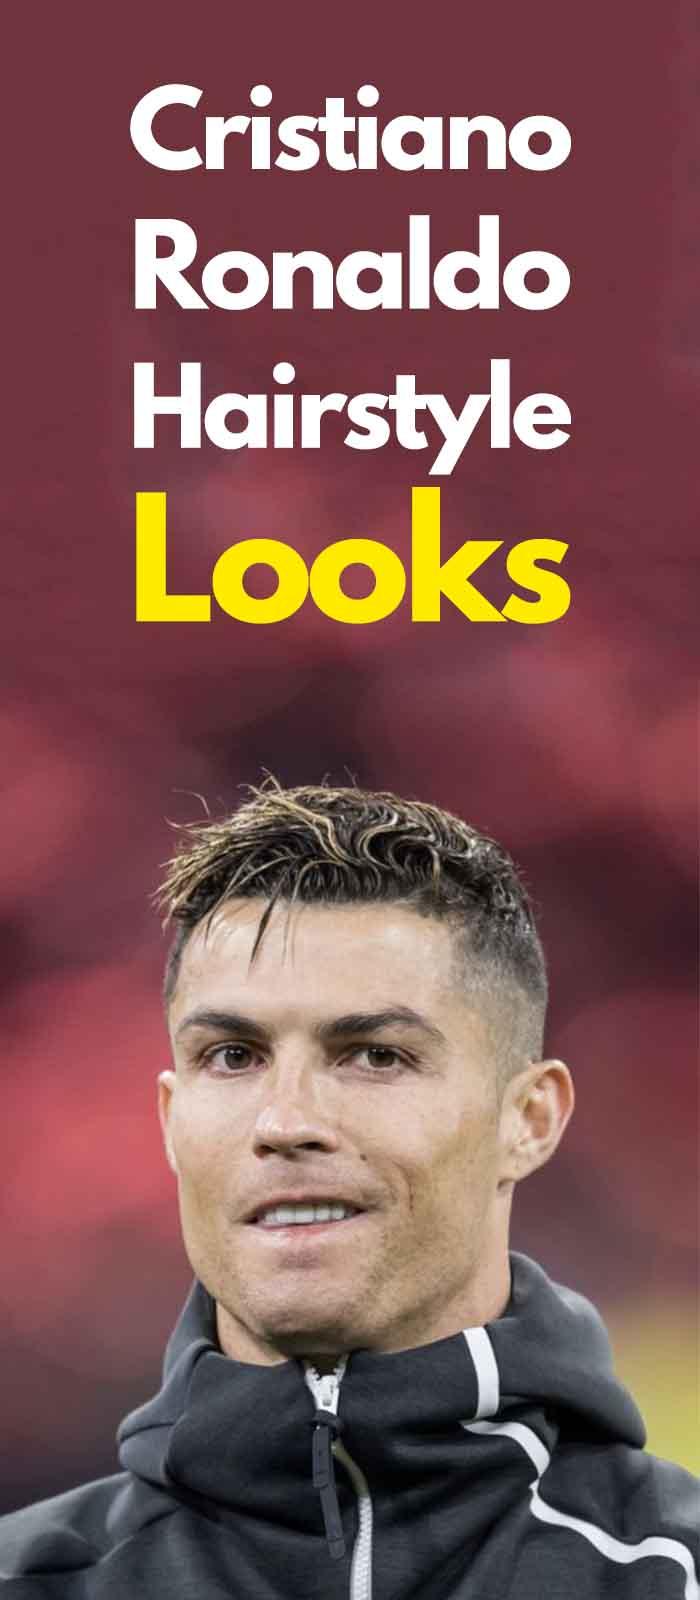 Hairstyle Looks Cristiano Ronaldo